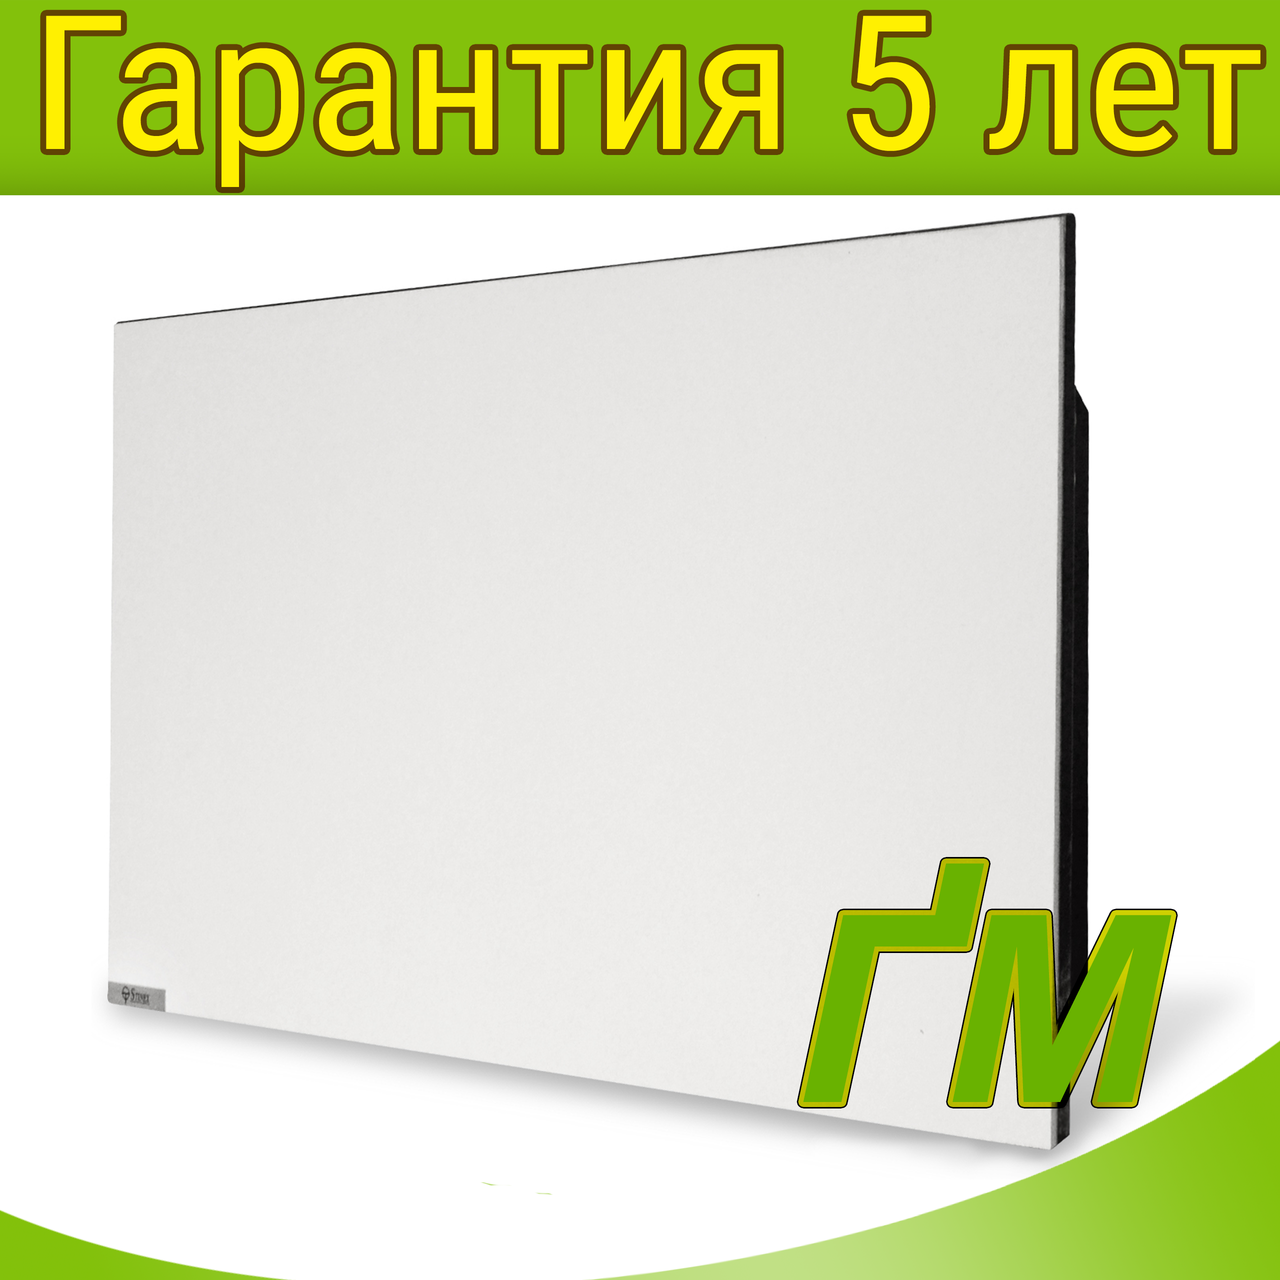 Электронагревательная панель Ceramic 250/220 Standart White